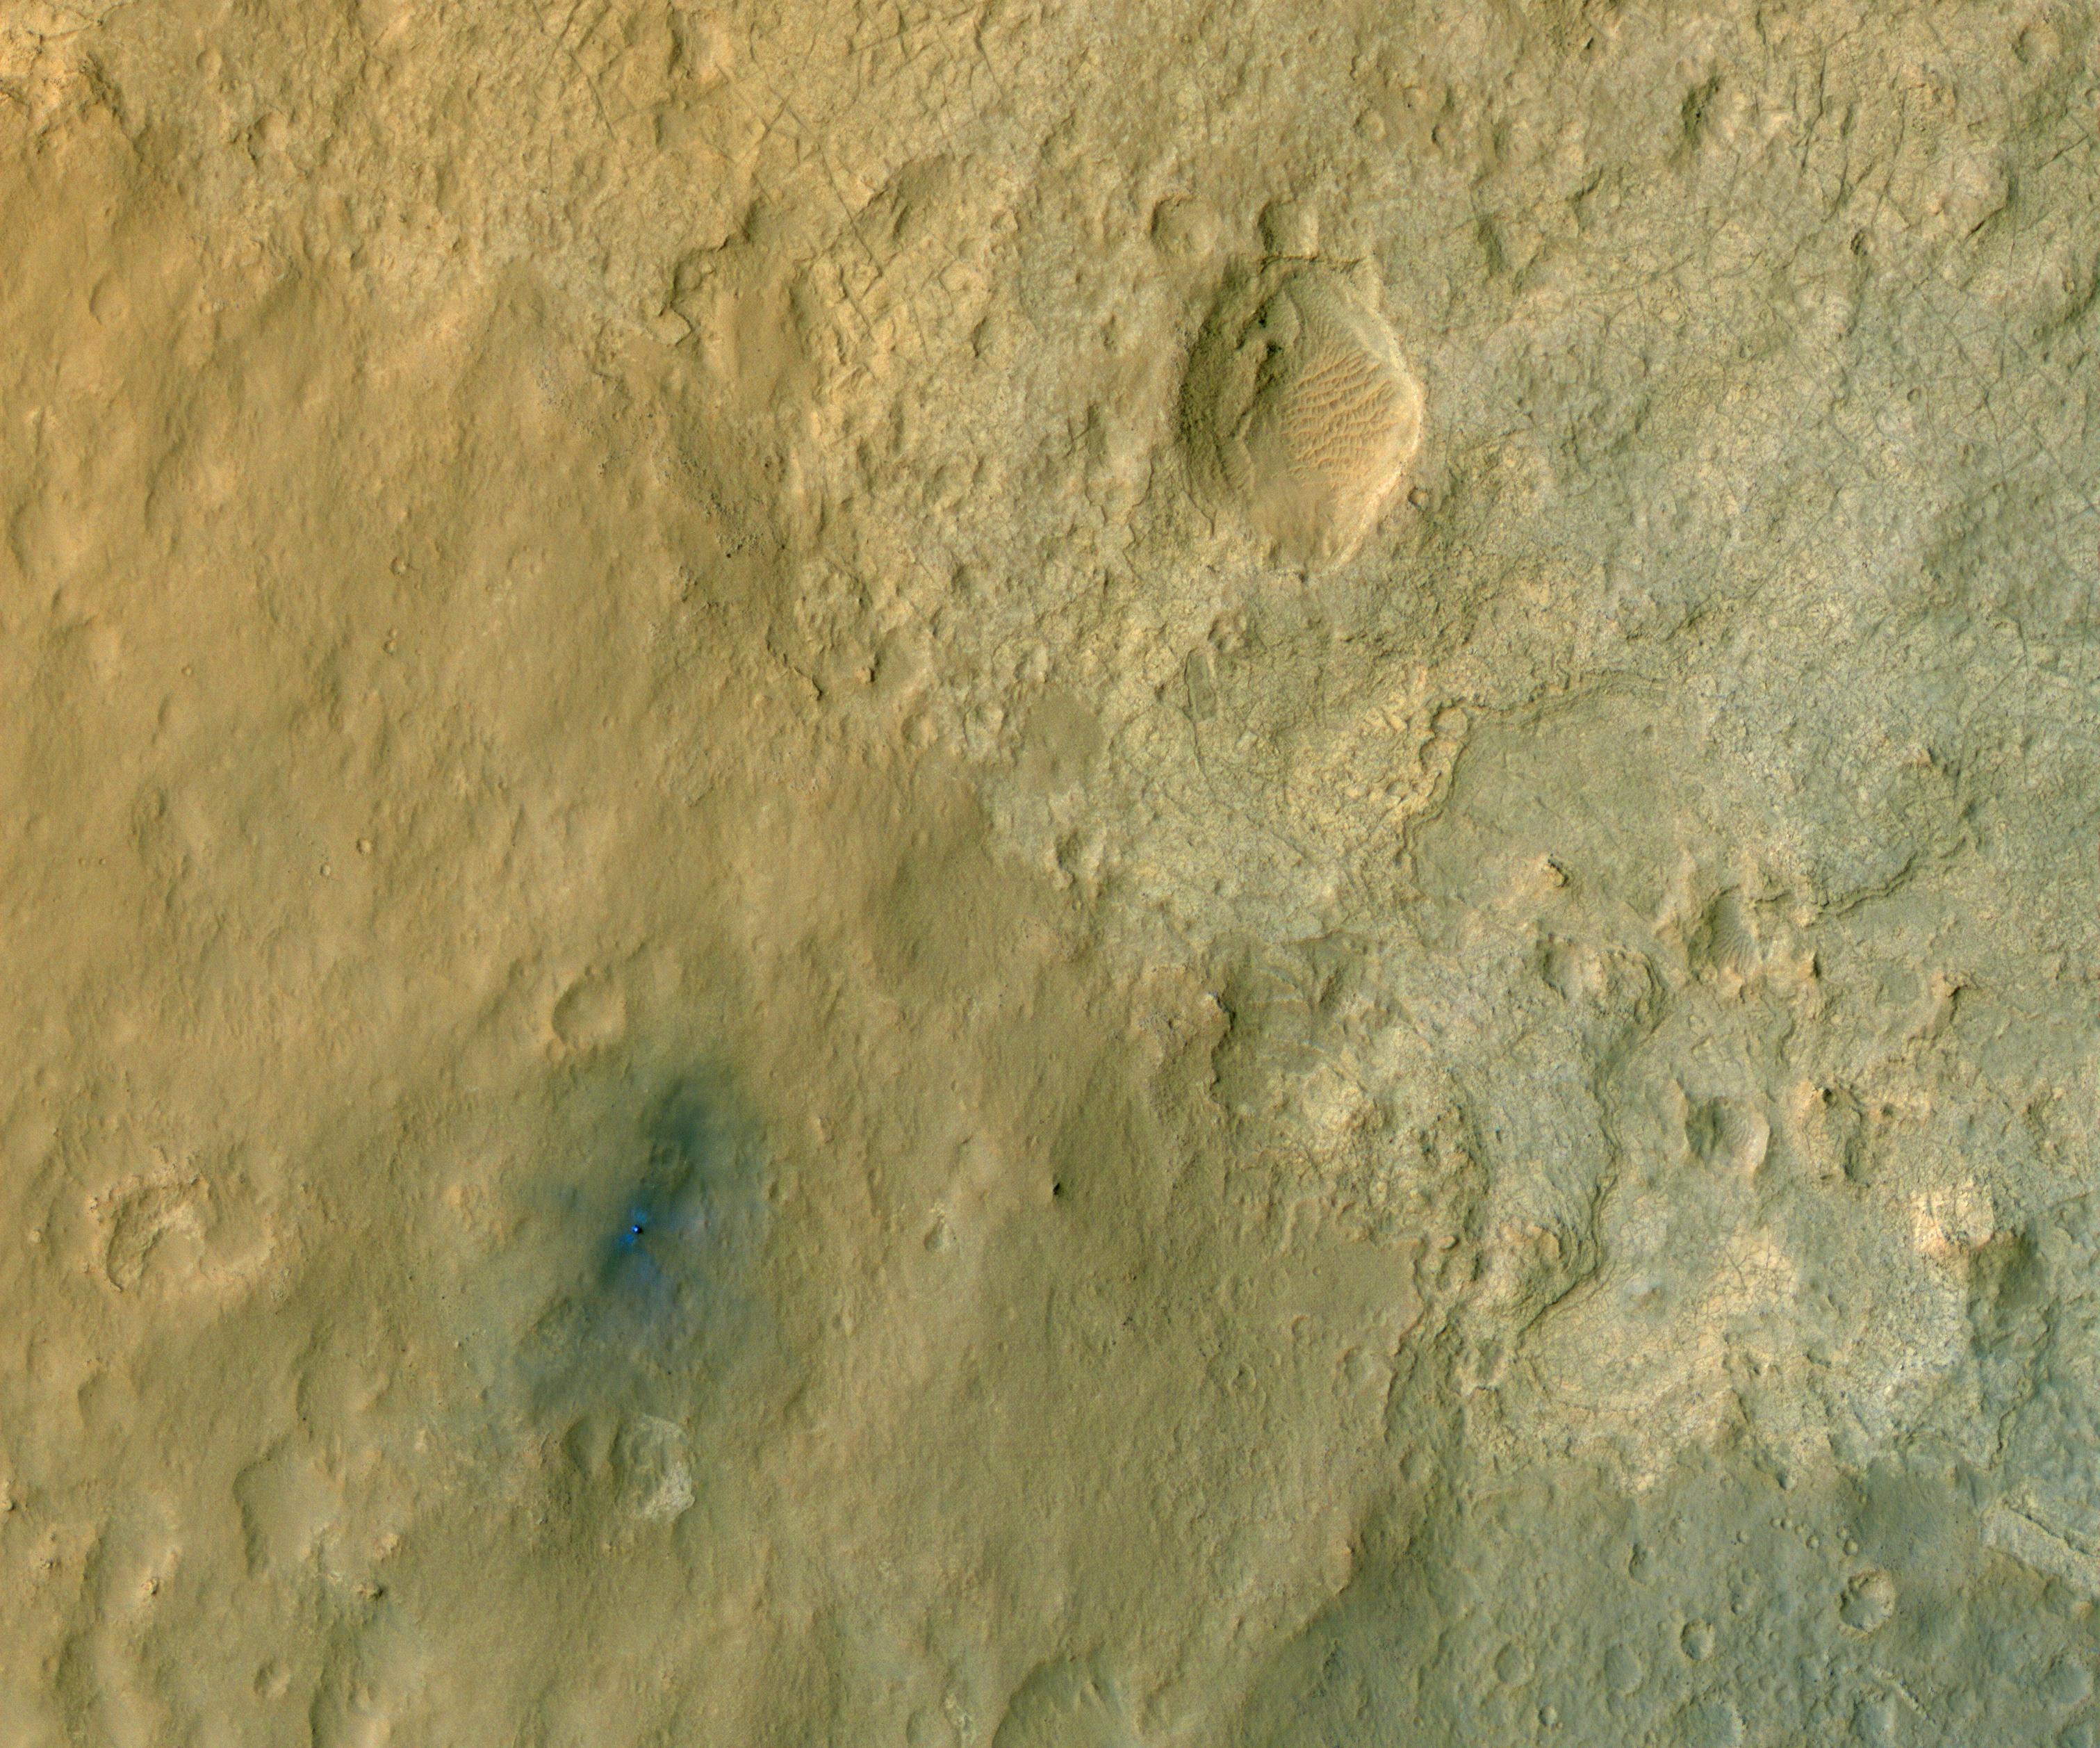 Nasa s Curiosity Mars rover seen in new satellite image BBC News